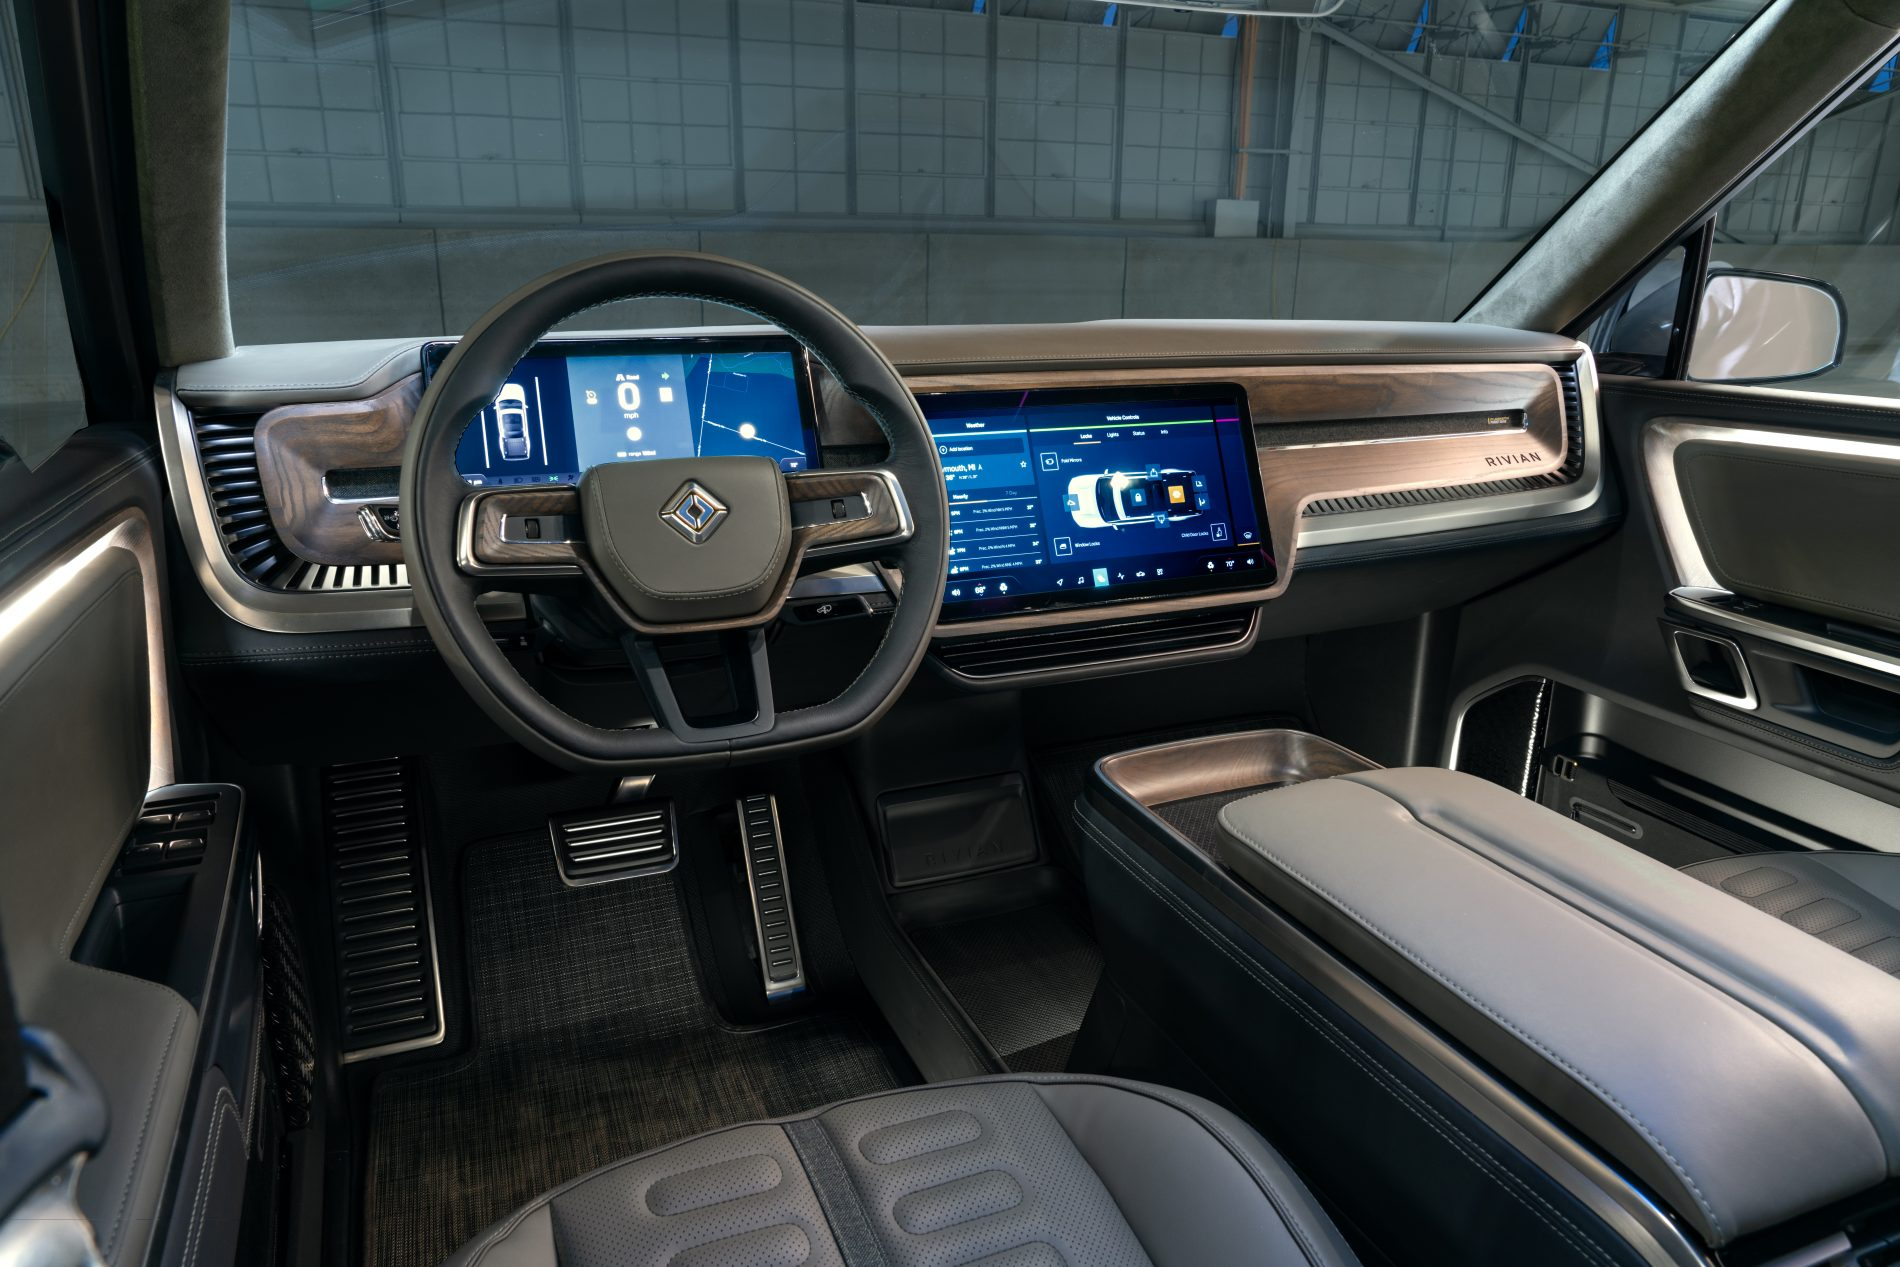 a-rivian-r1t-interior-front-e1543094108802.jpg